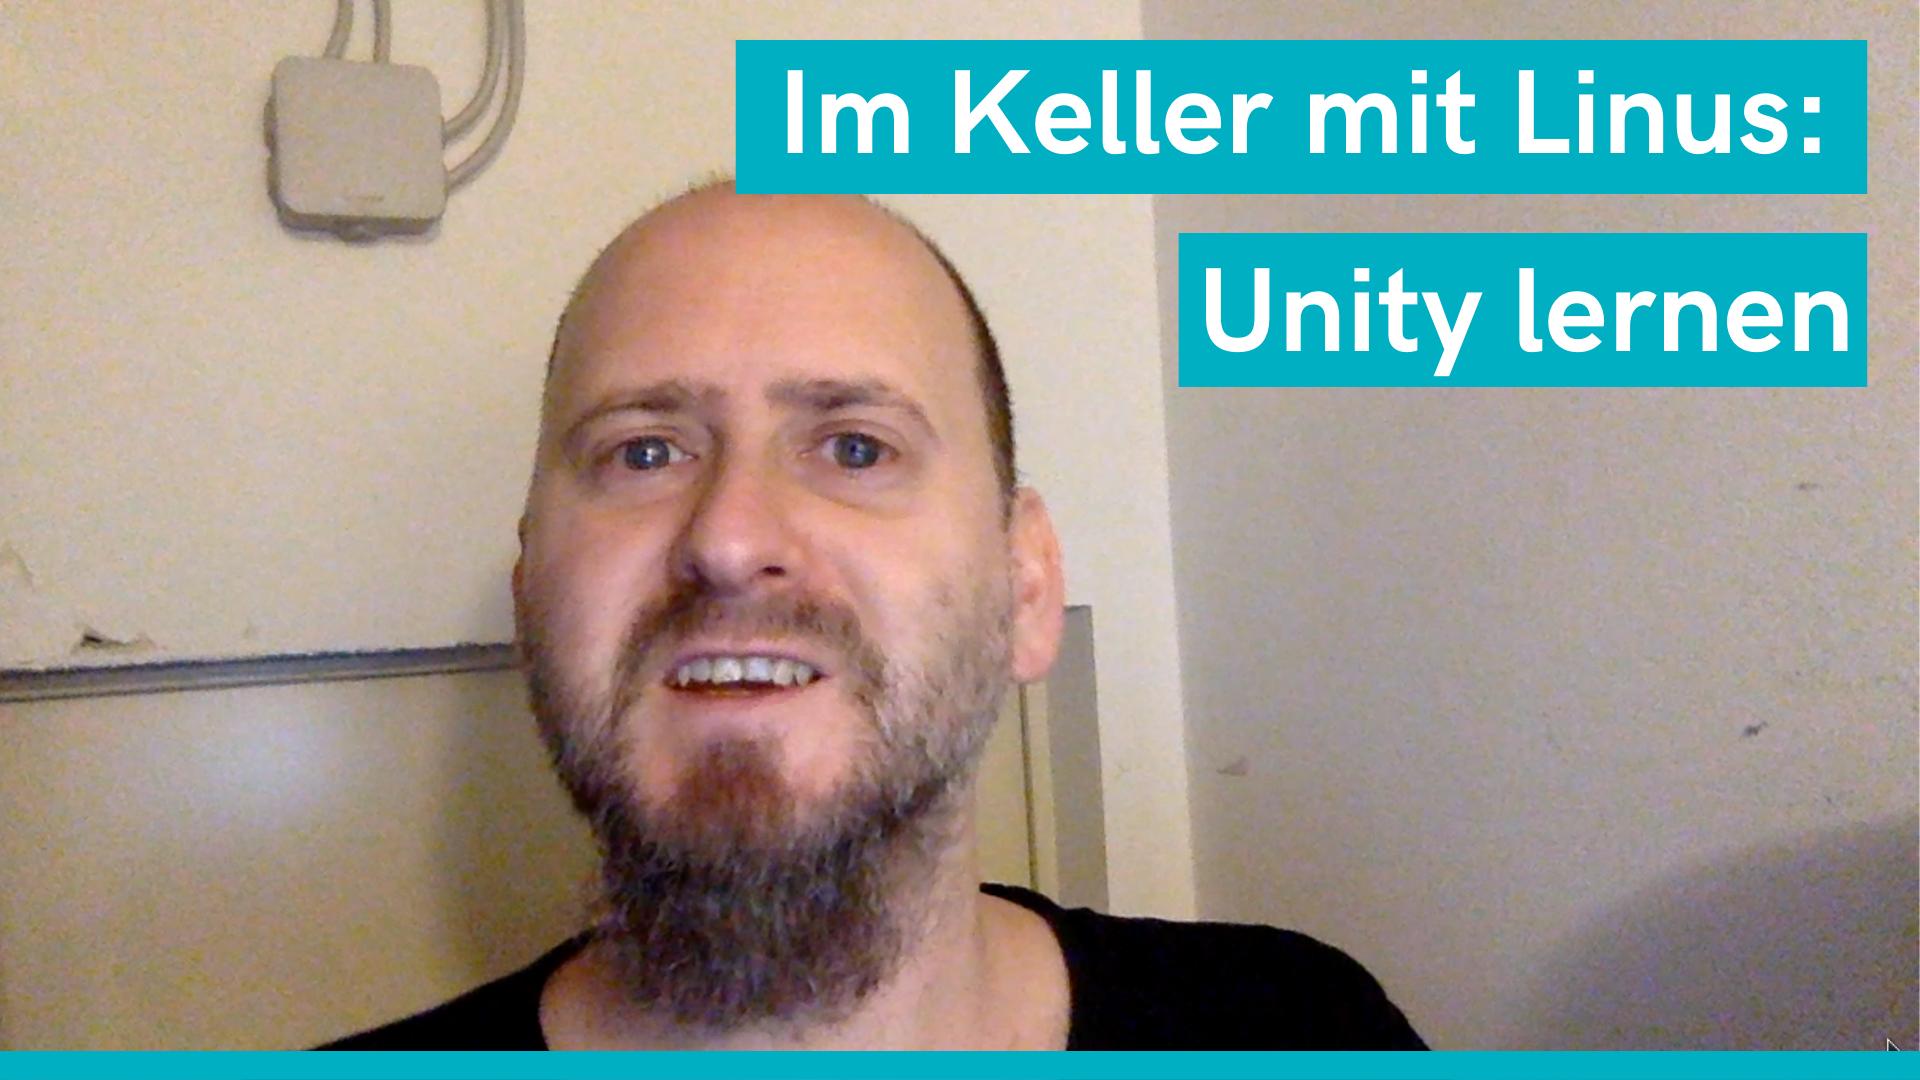 unity lernen